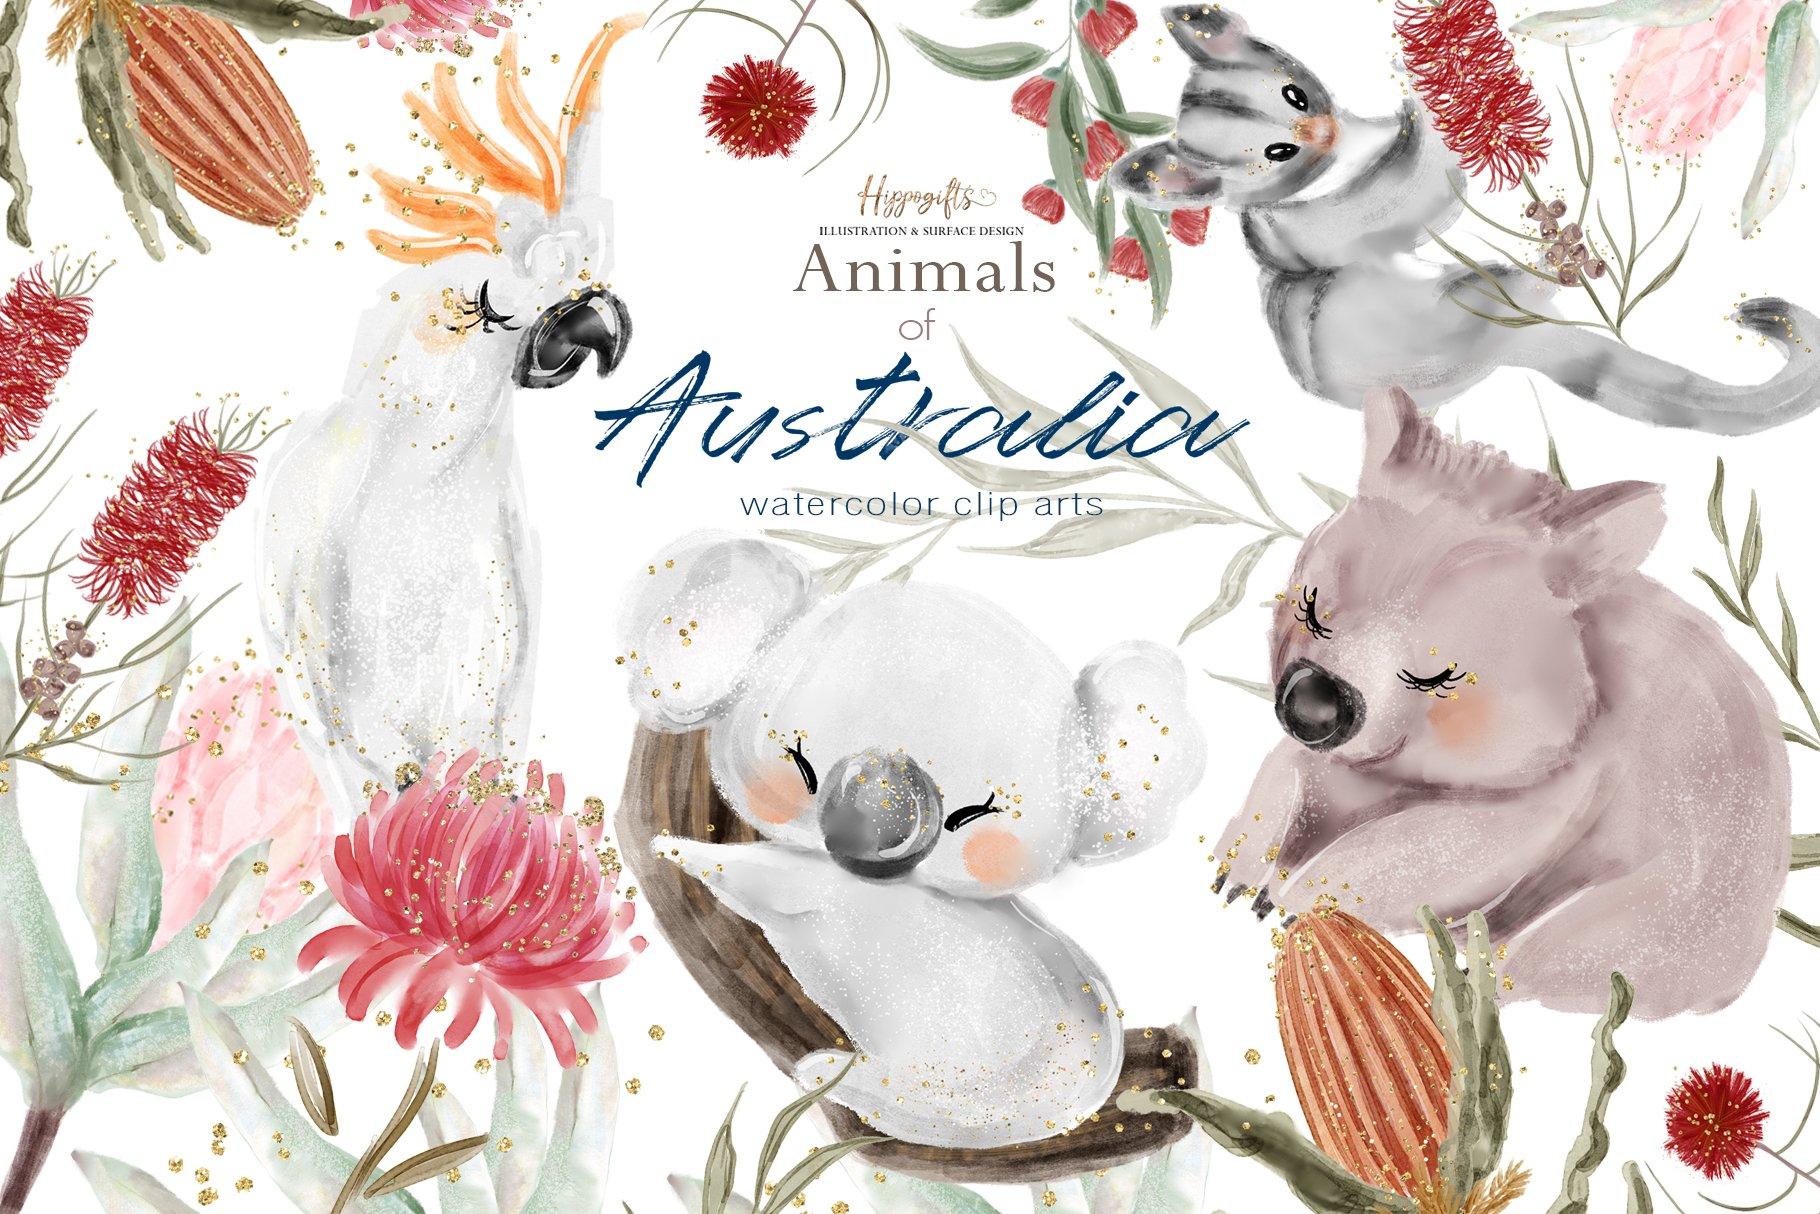 澳大利亚动物水彩画PNG免抠透明图片素材 Australia Animals Illustration插图